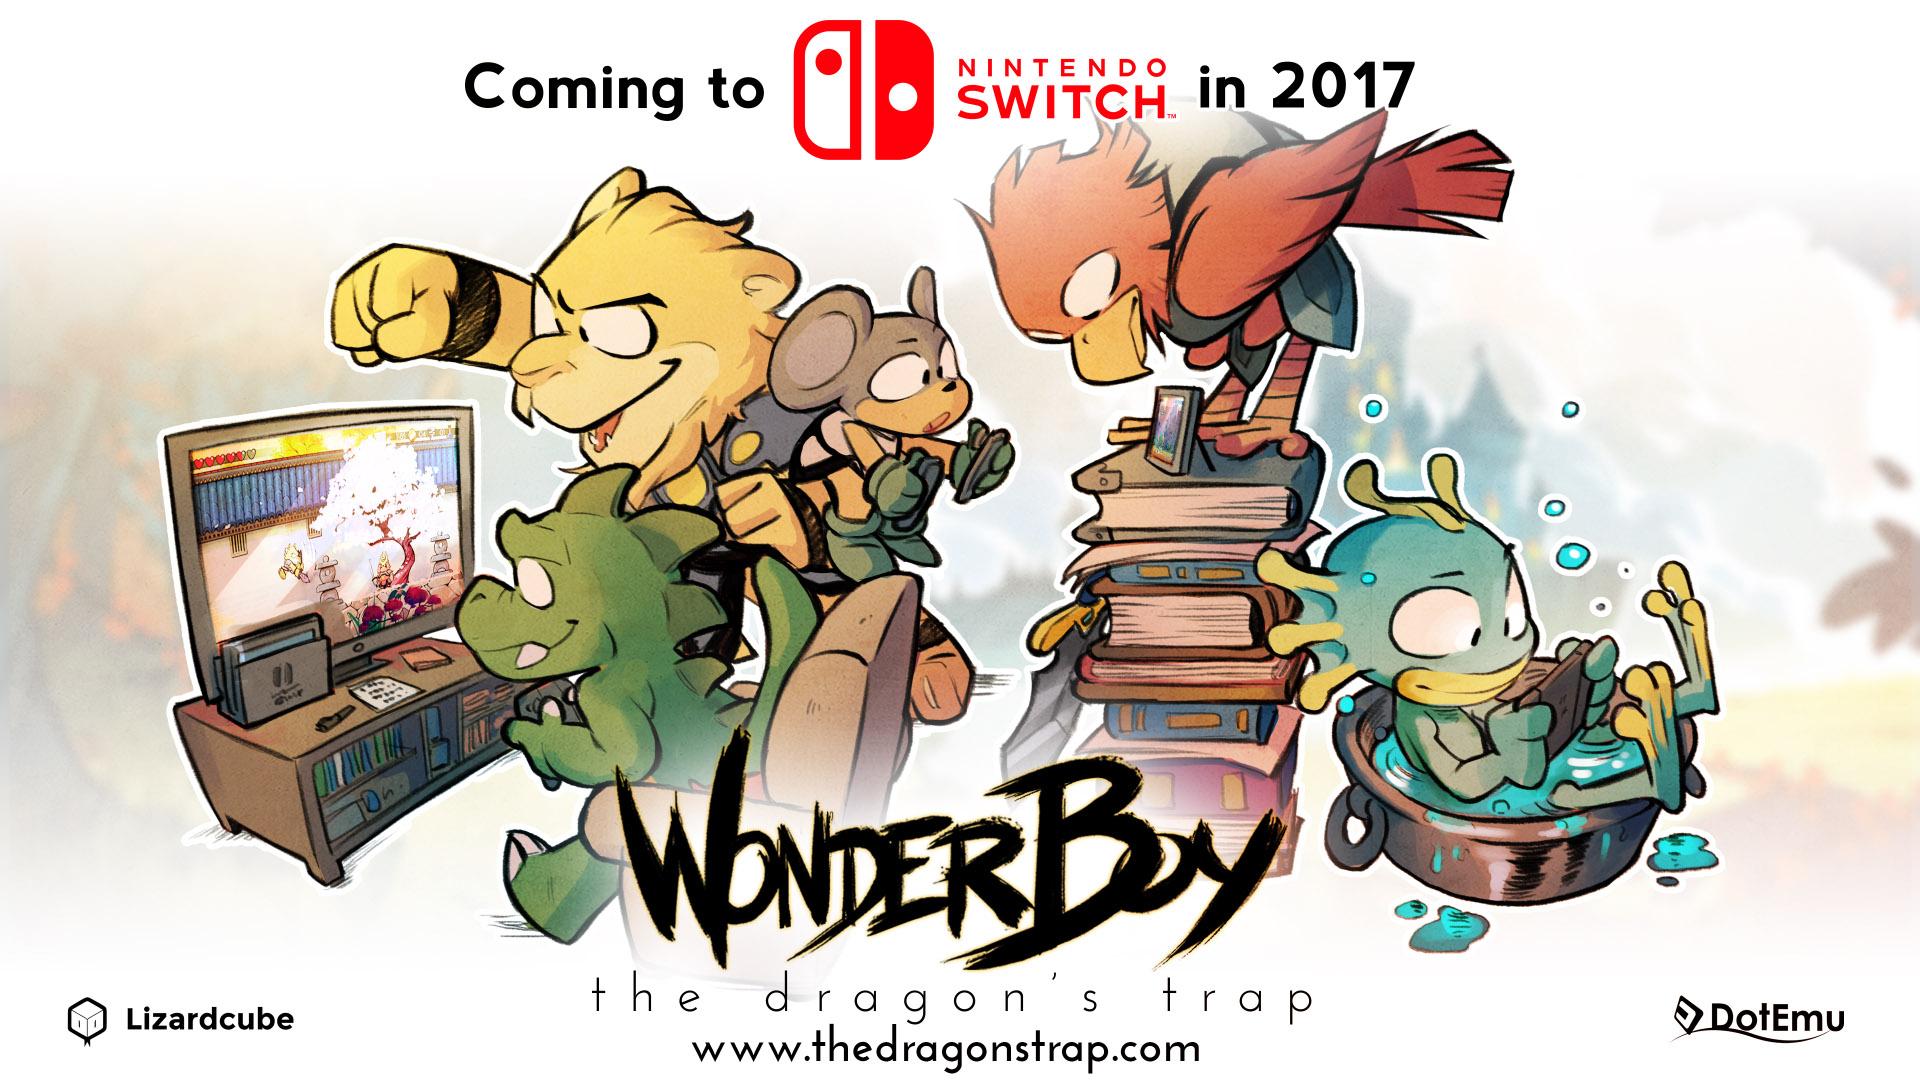 WonderBoyTheDragonsTrap-NintendoSwitch.j